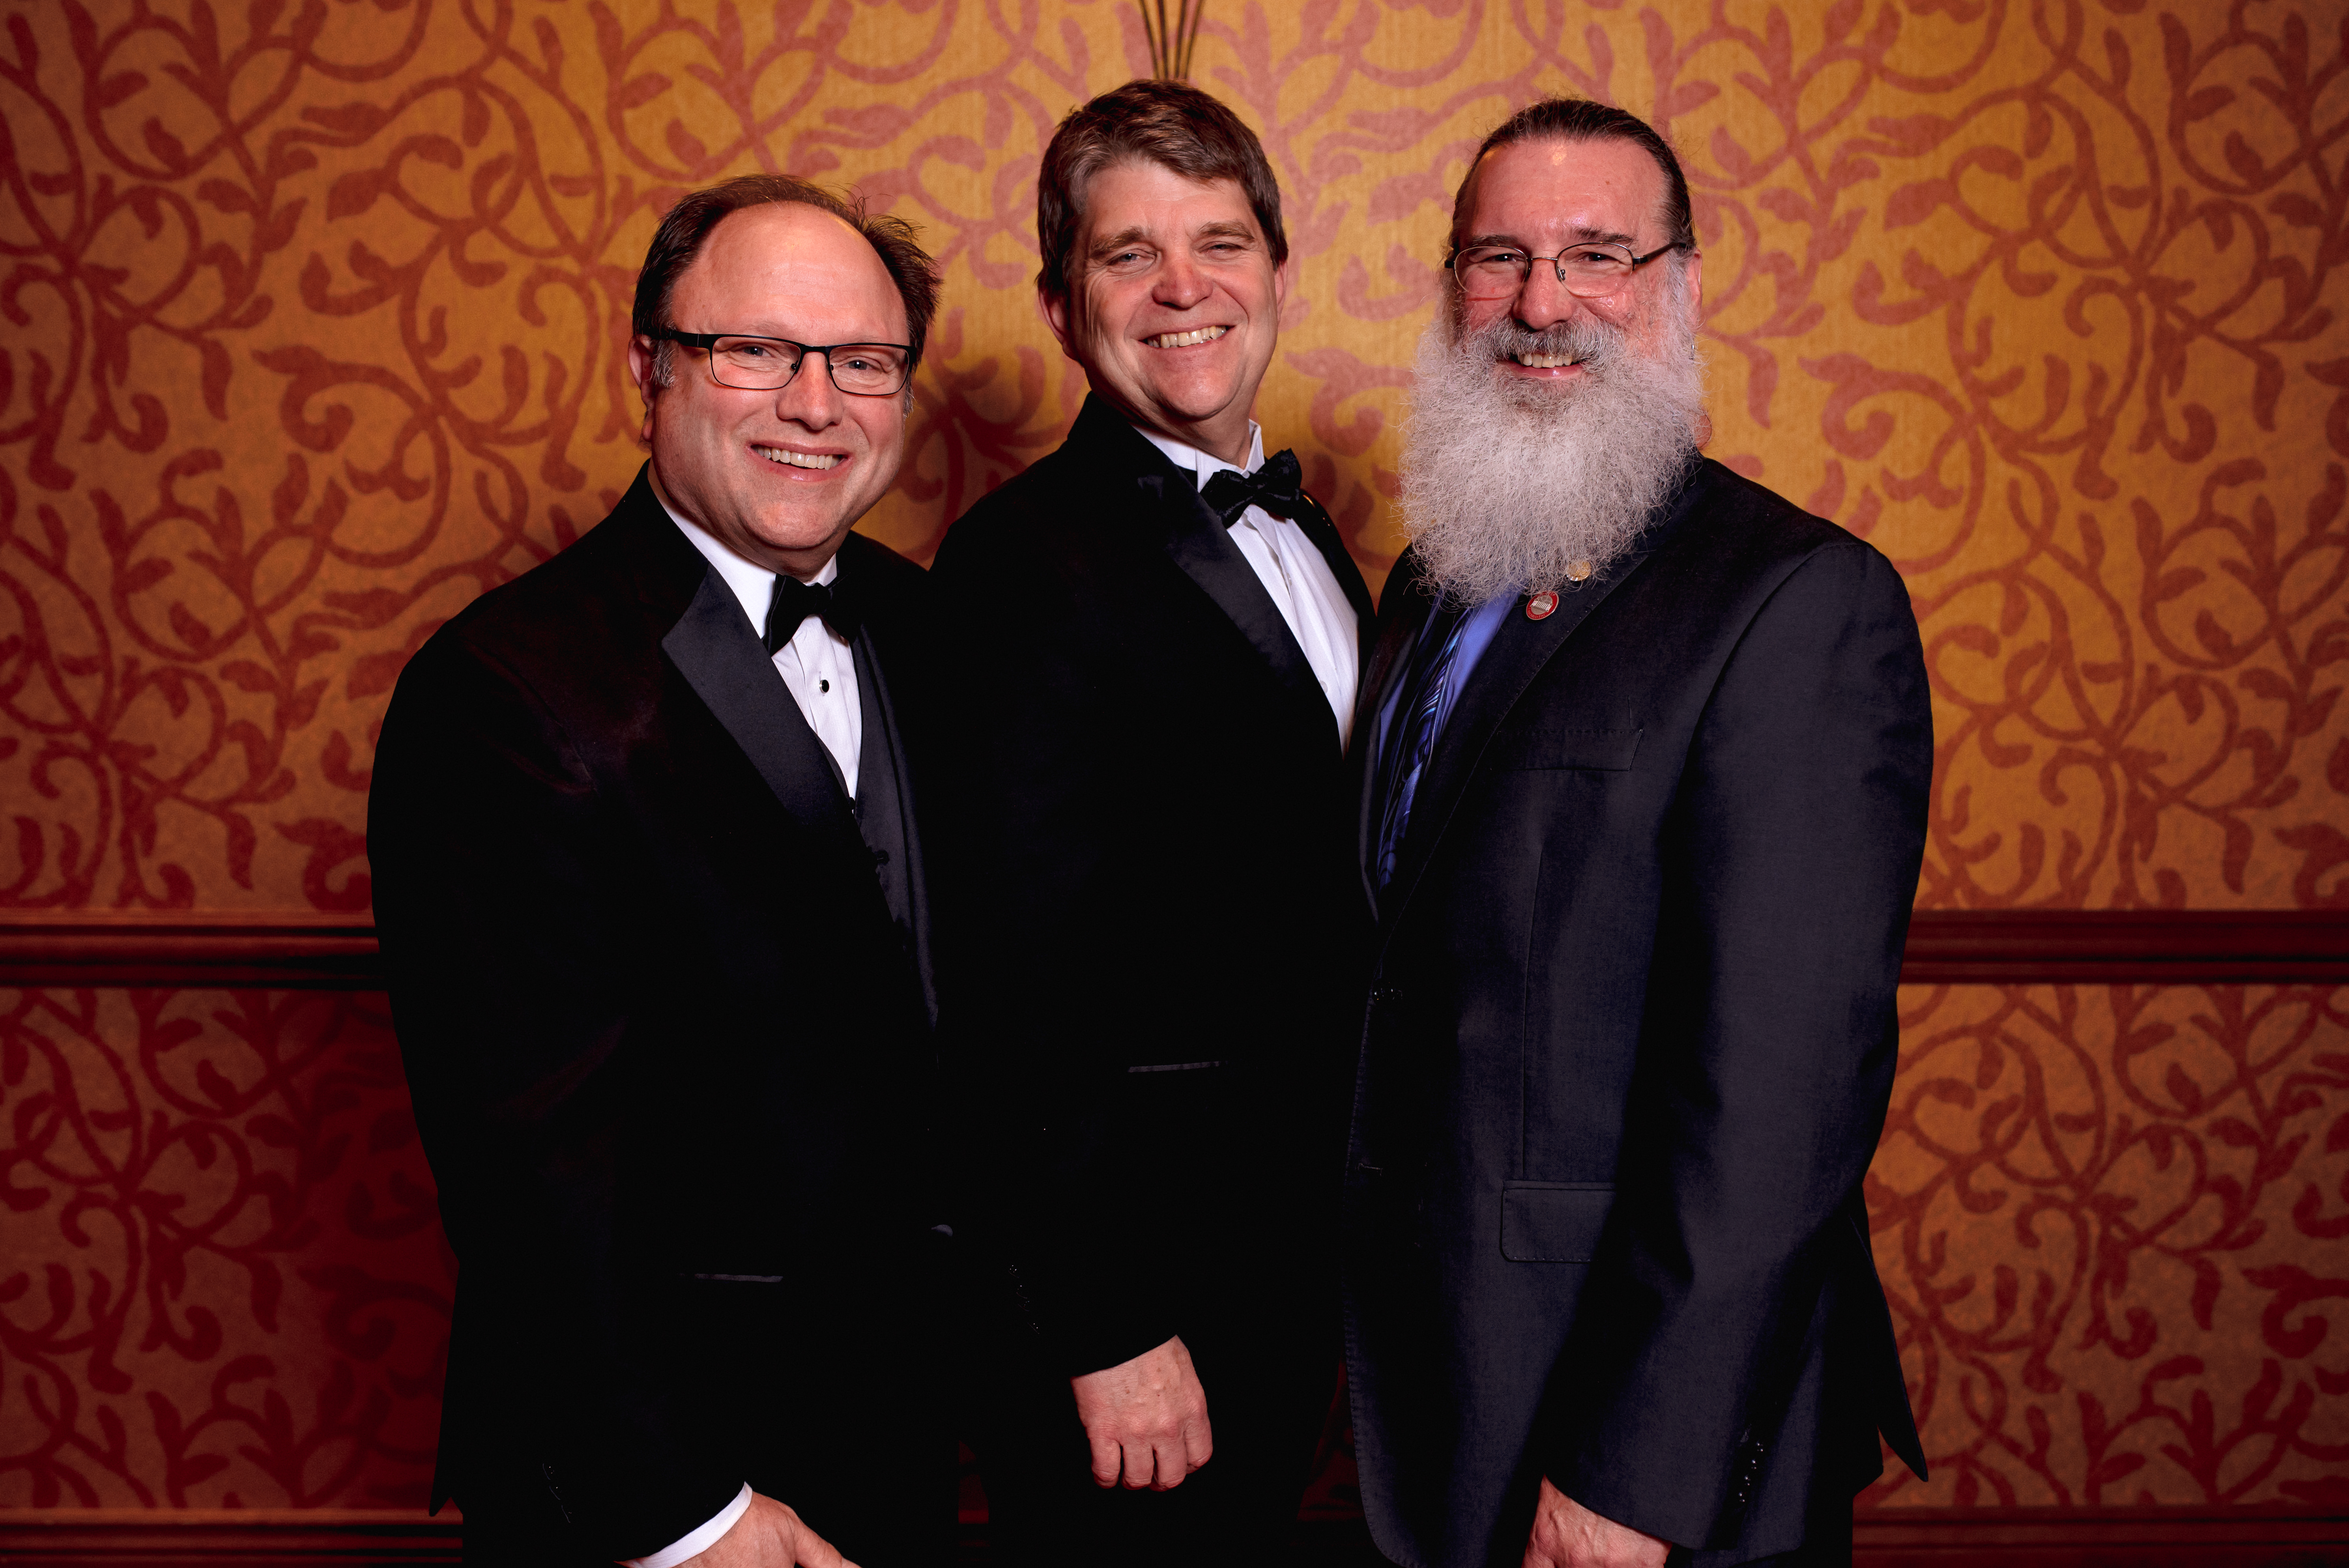 The AAFP President & Two AAFP Past Presidents in Nebraska